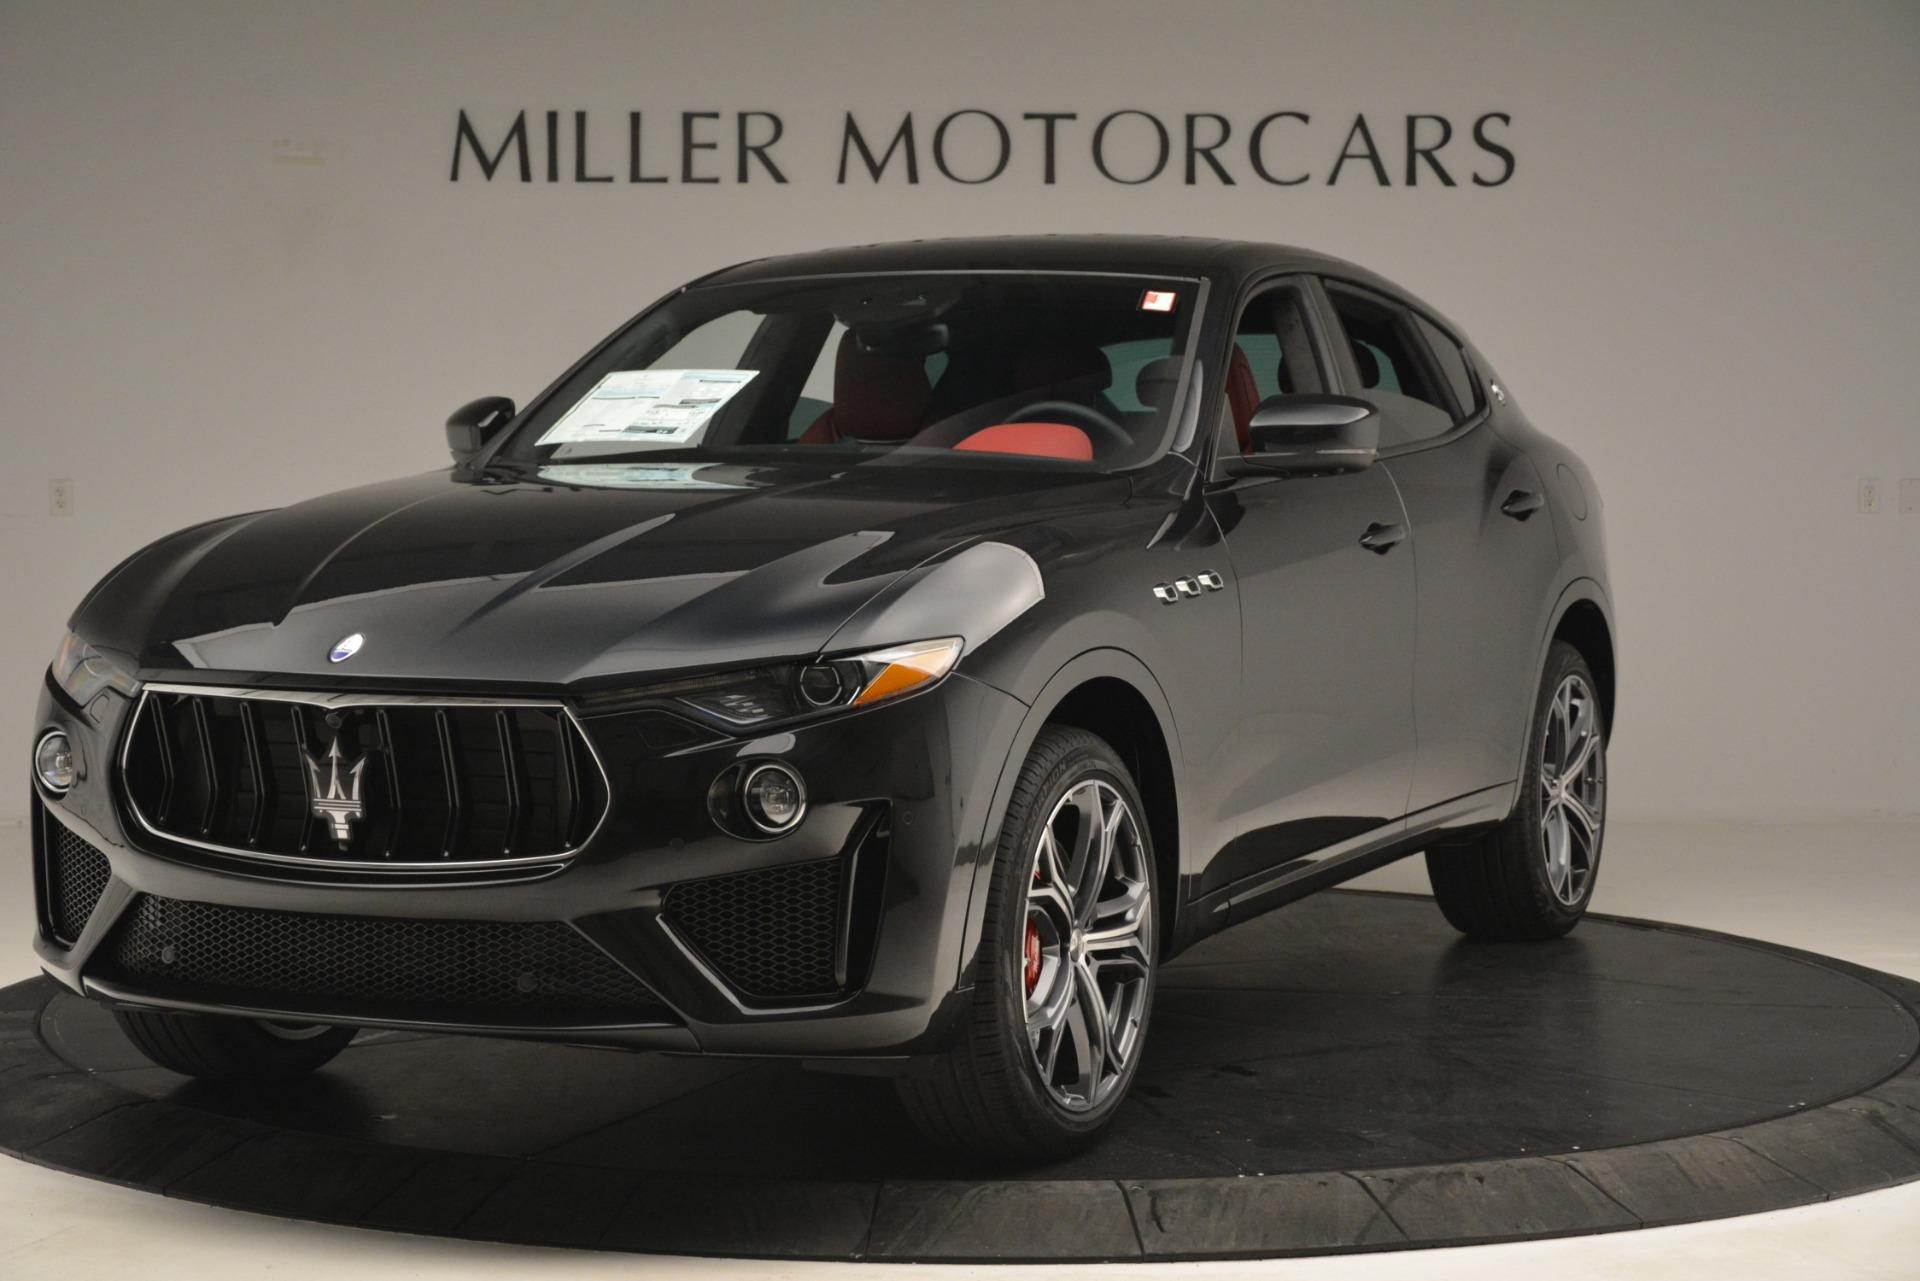 New 2019 Maserati Levante GTS For Sale In Westport, CT 3023_main